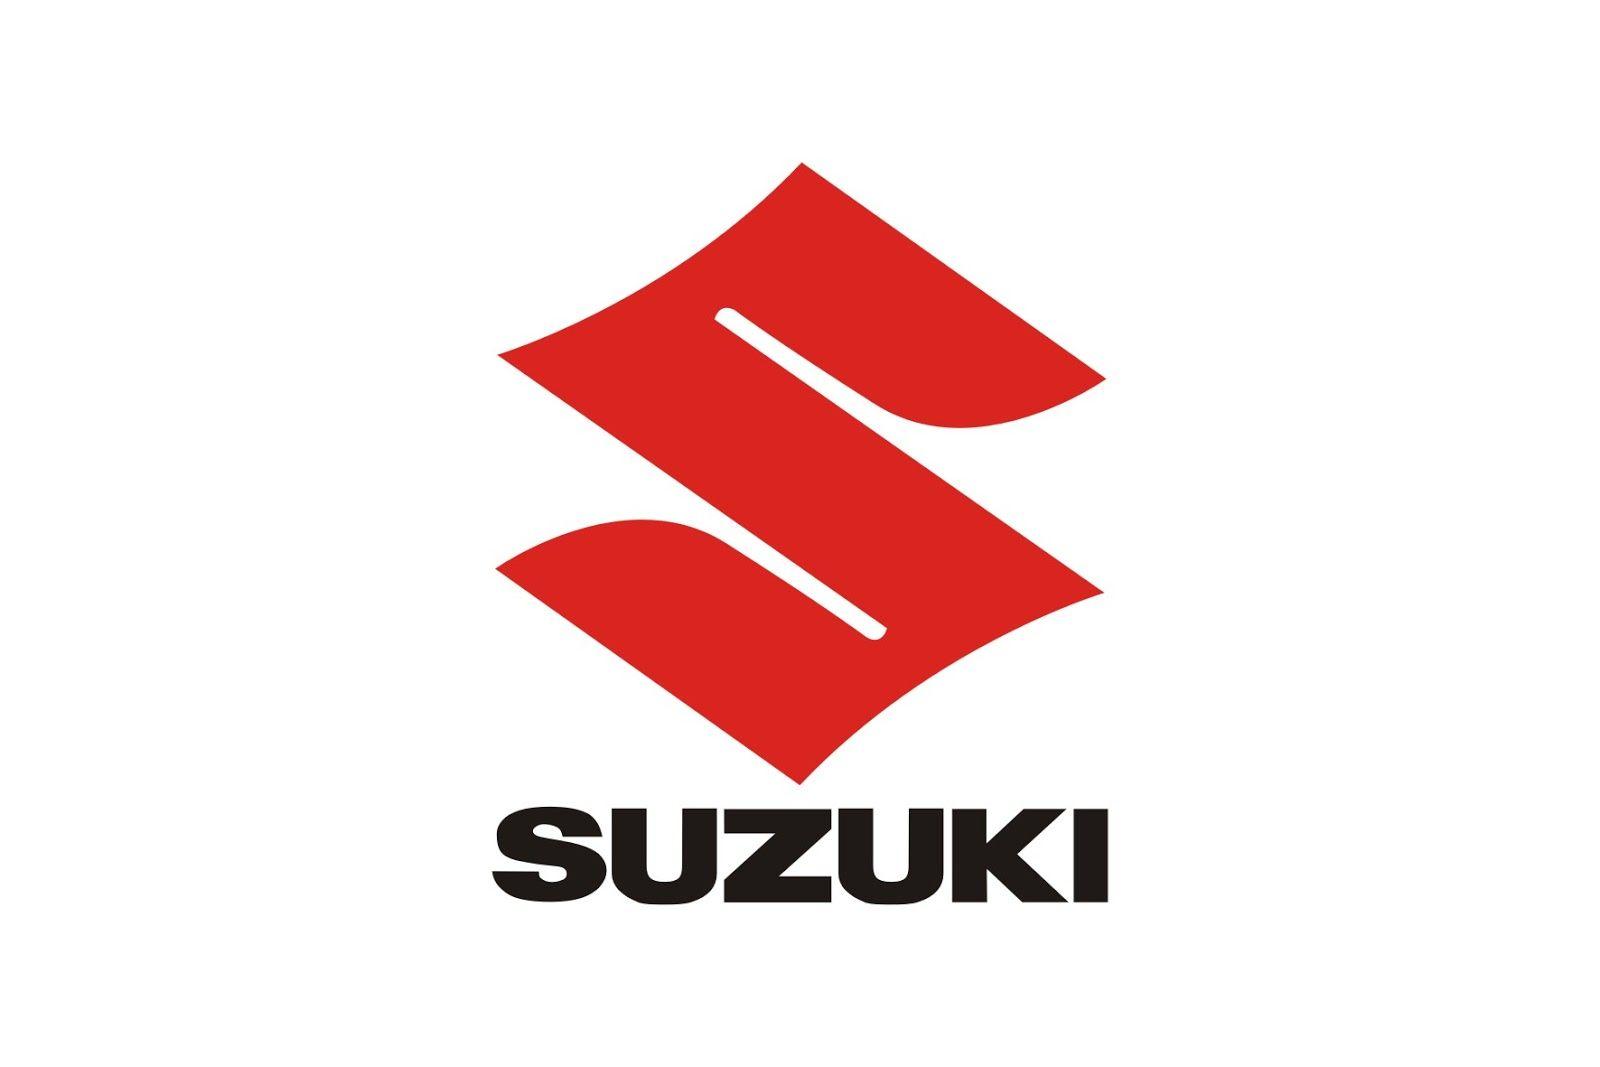 Pin Suzuki Logo Vector Pelautscom Picture To Pinterest Description From Tattoopins Com I Searched For This On Bing Com Im Suzuki Cars Car Brands Logos Suzuki